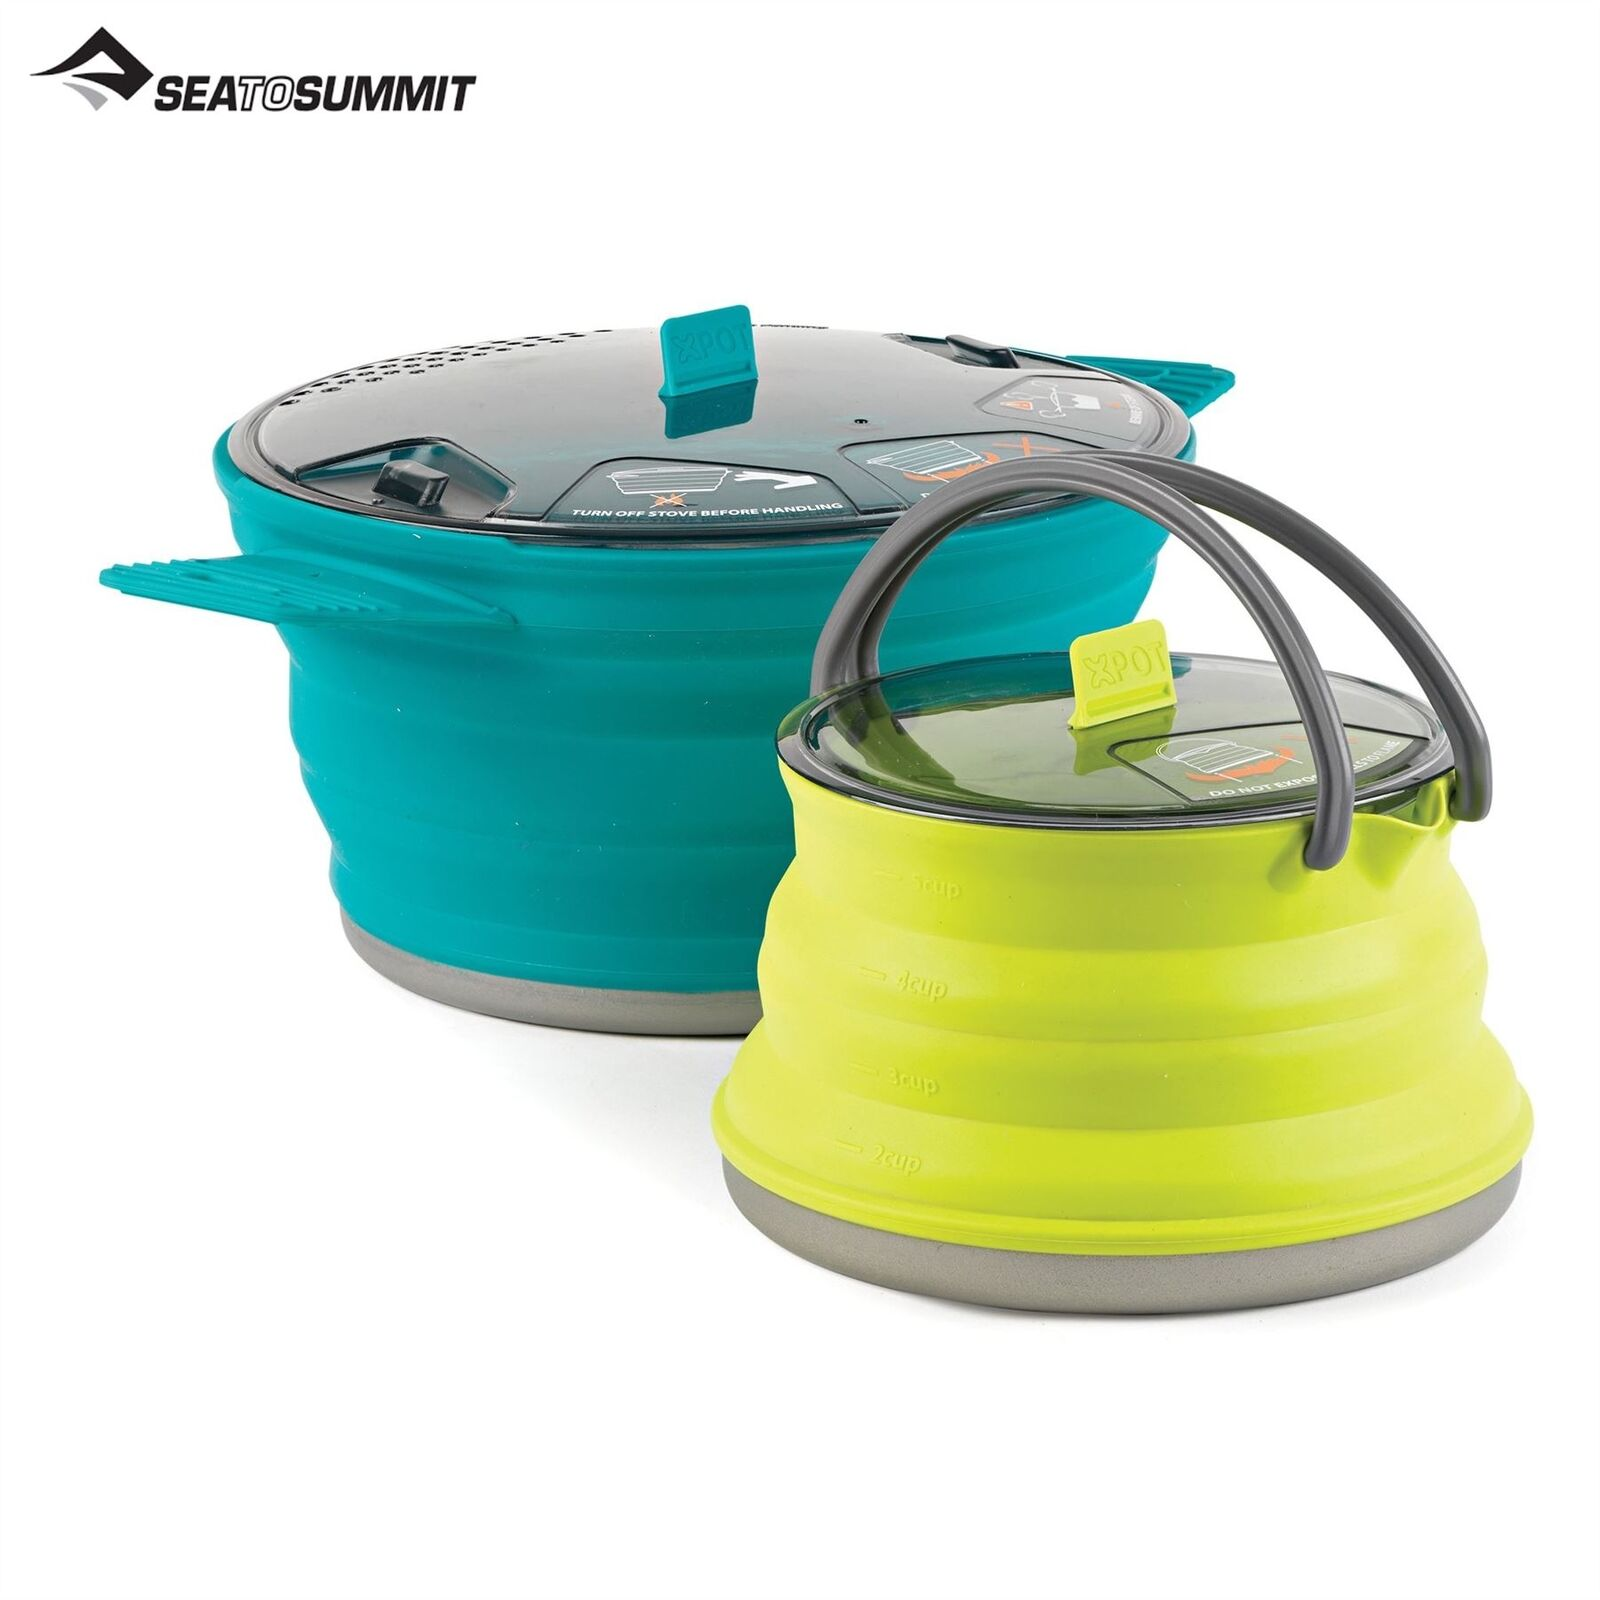 Sea to summit Plegable Camping Hervidor & Olla Pan BPA libre de silicona ligero